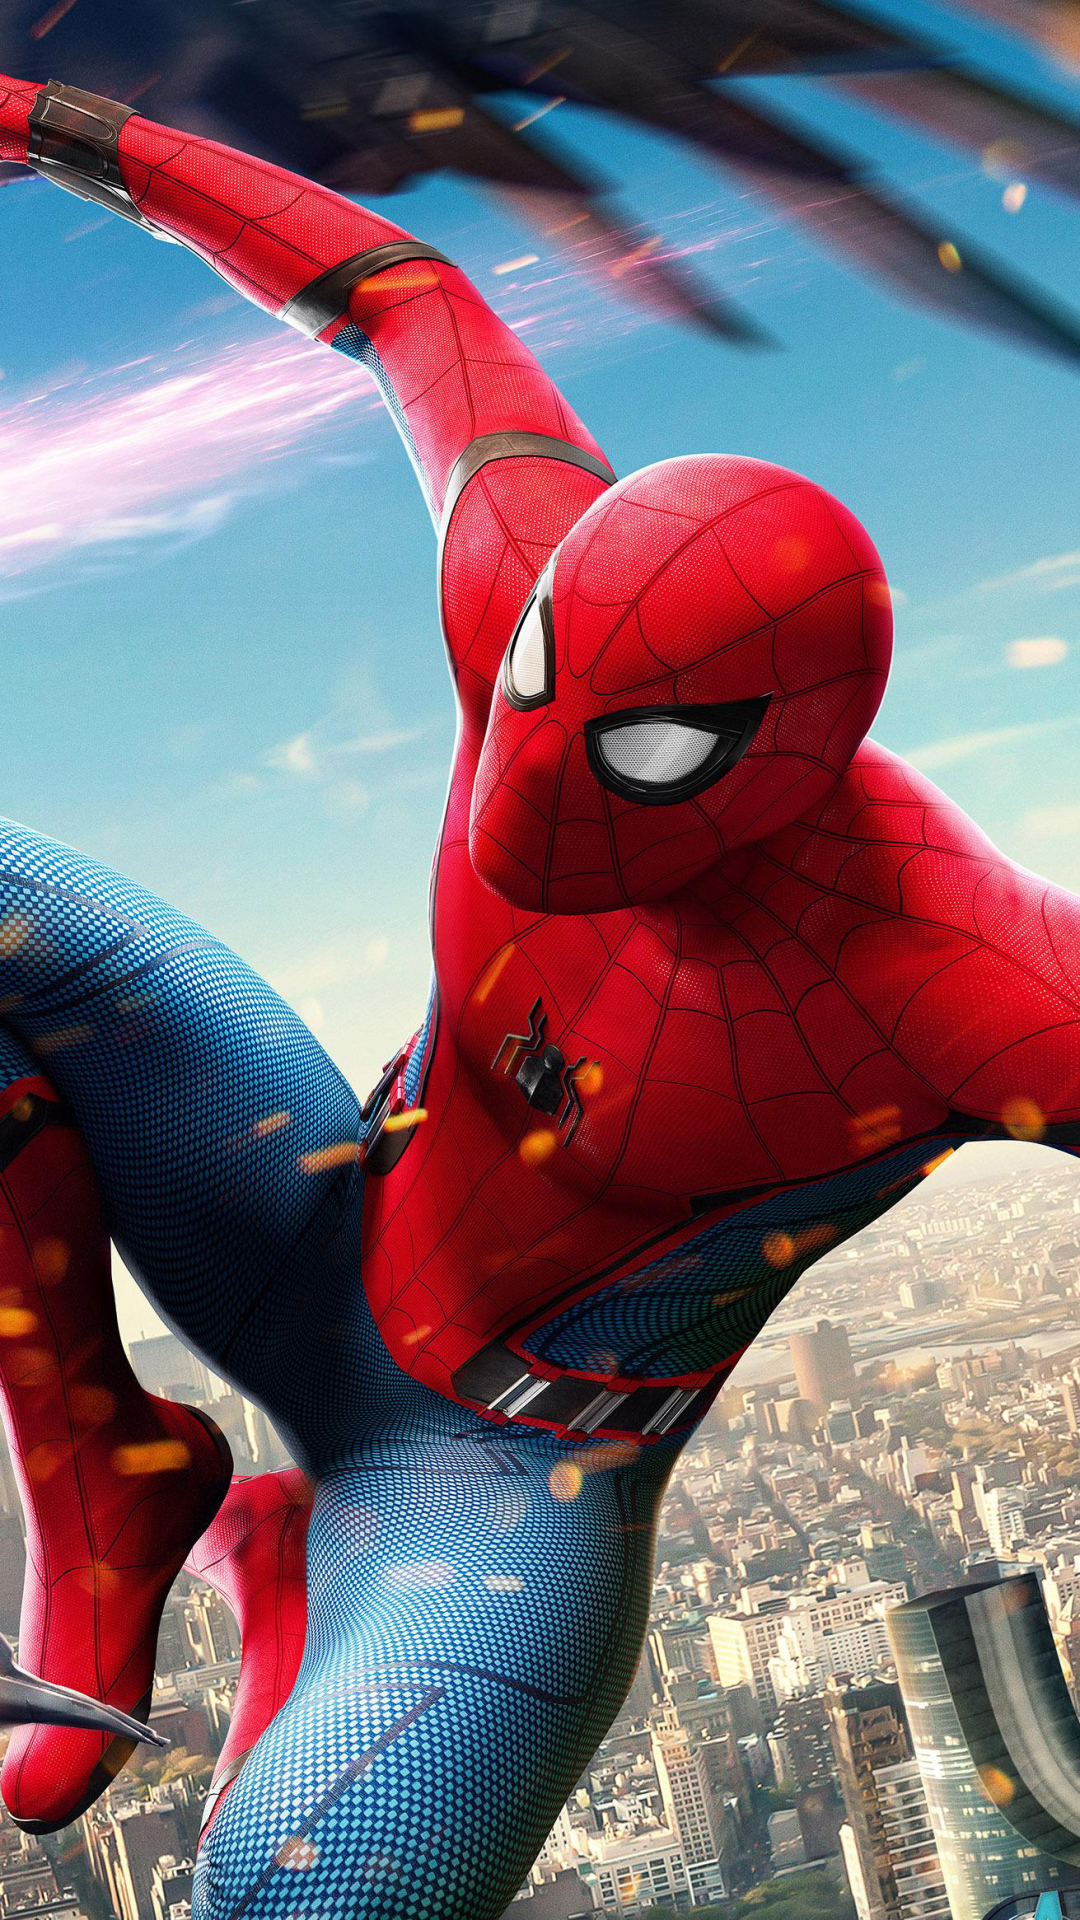 Spider Man Hd Wallpaper Full Screen - HD Wallpaper